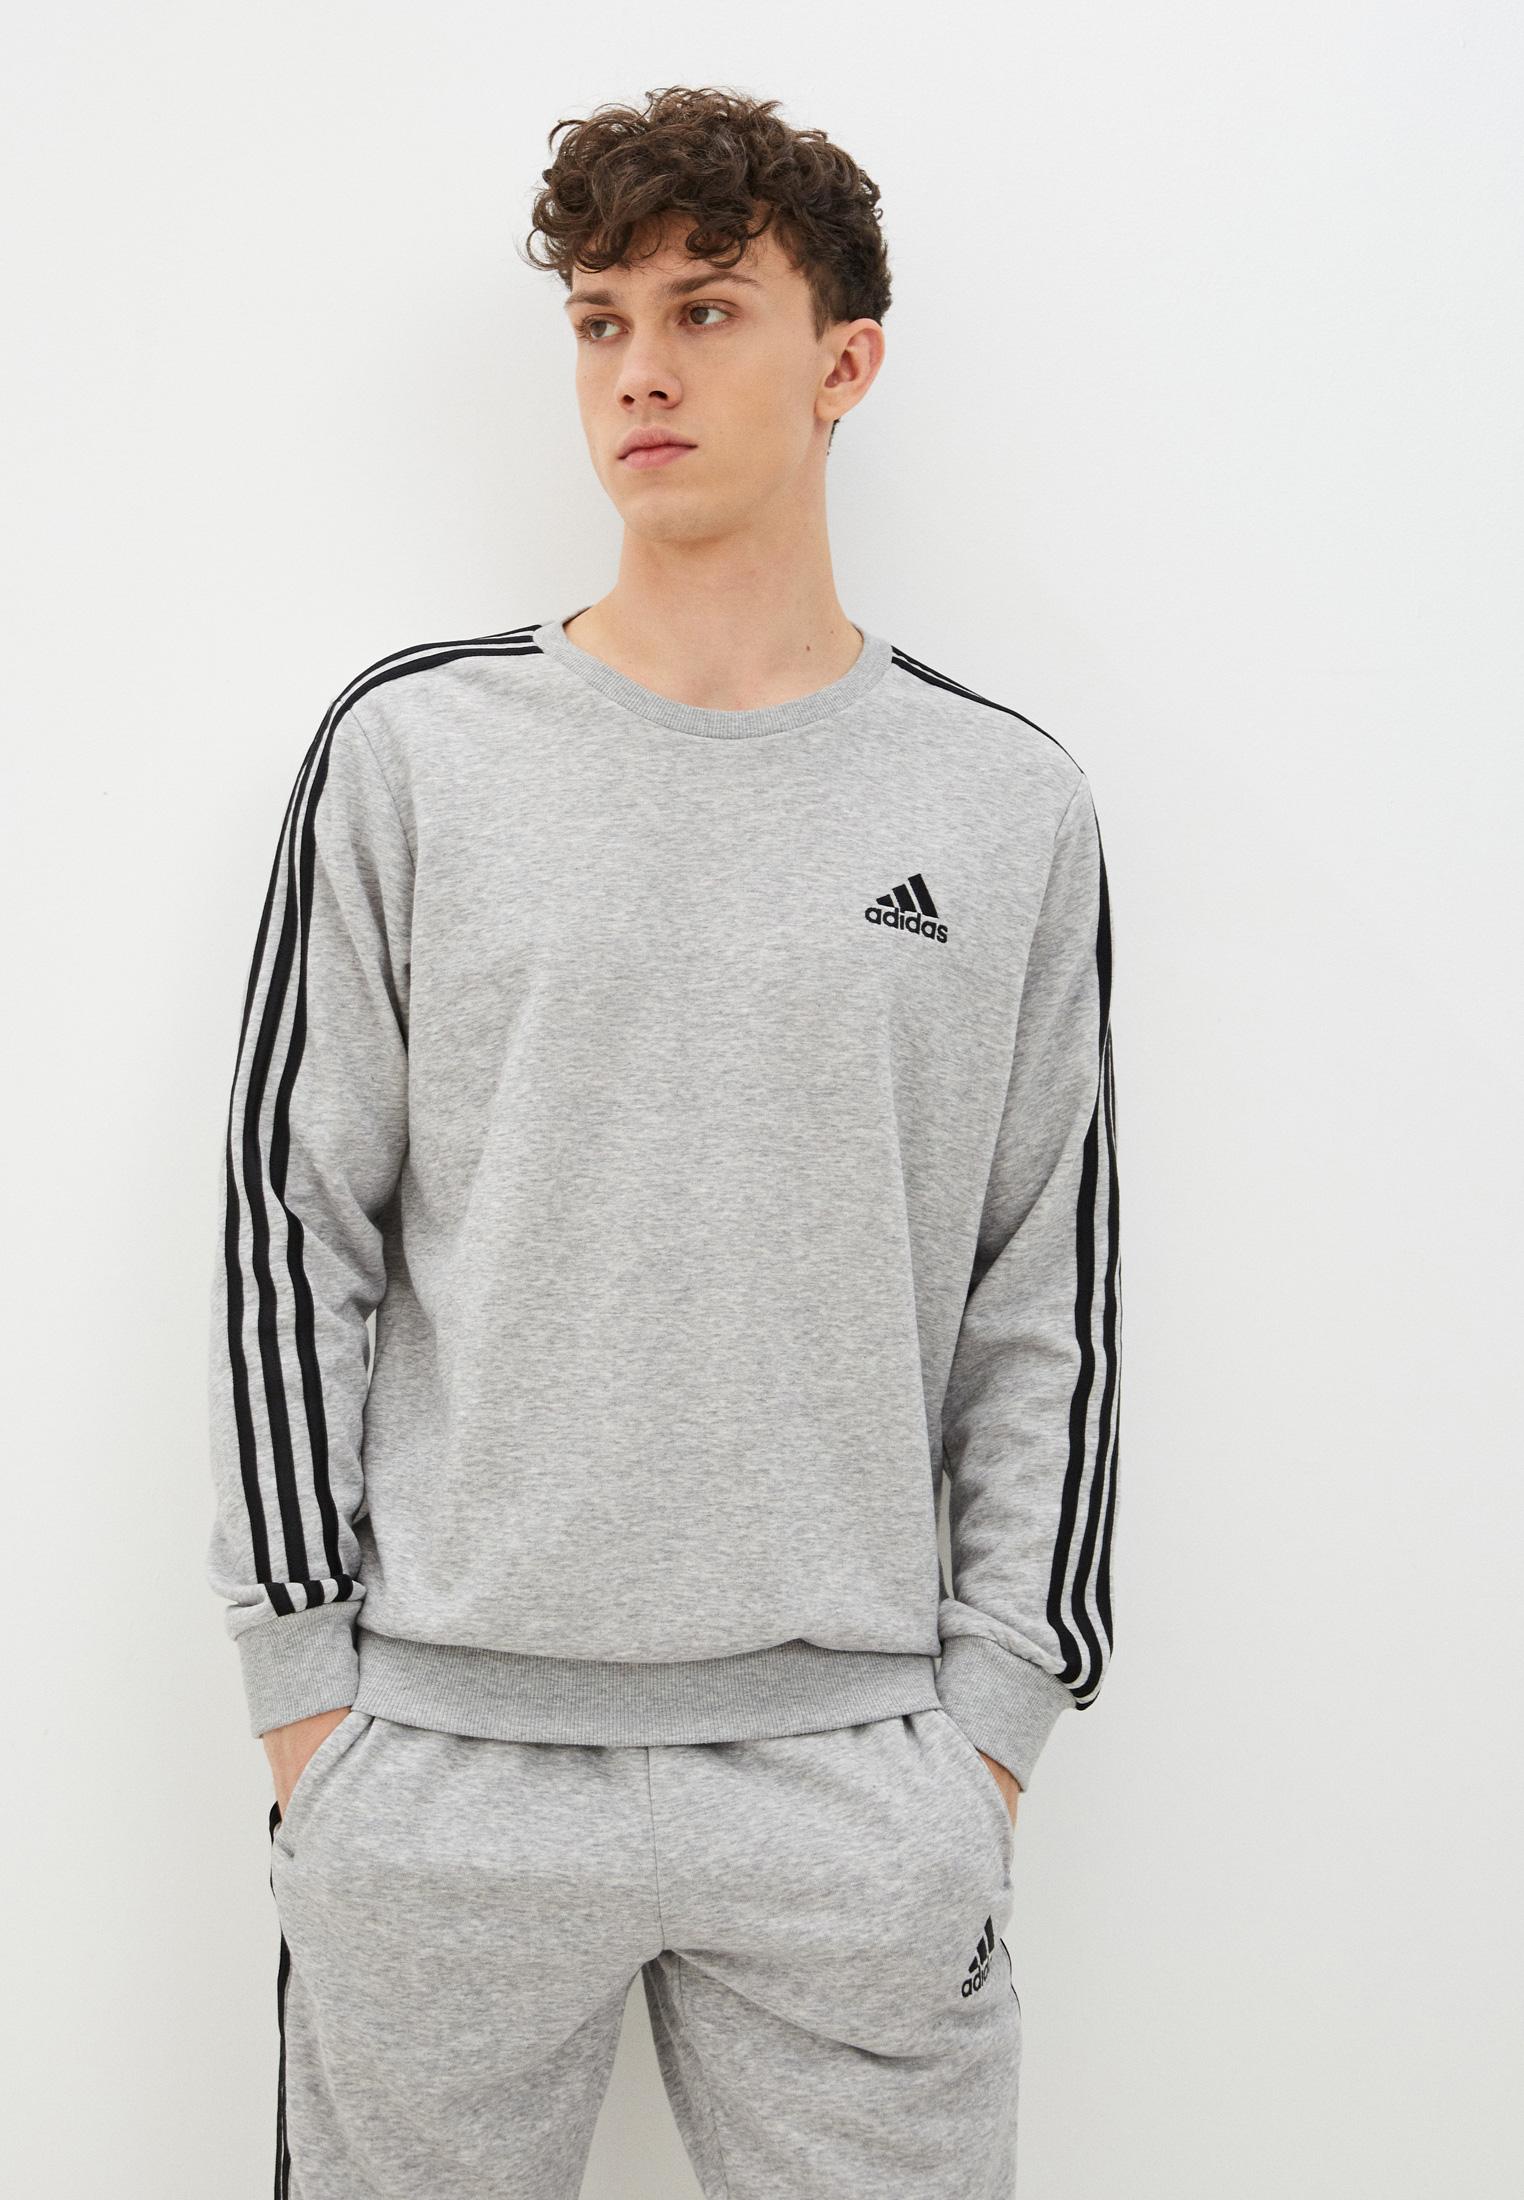 Толстовка Adidas (Адидас) Свитшот adidas